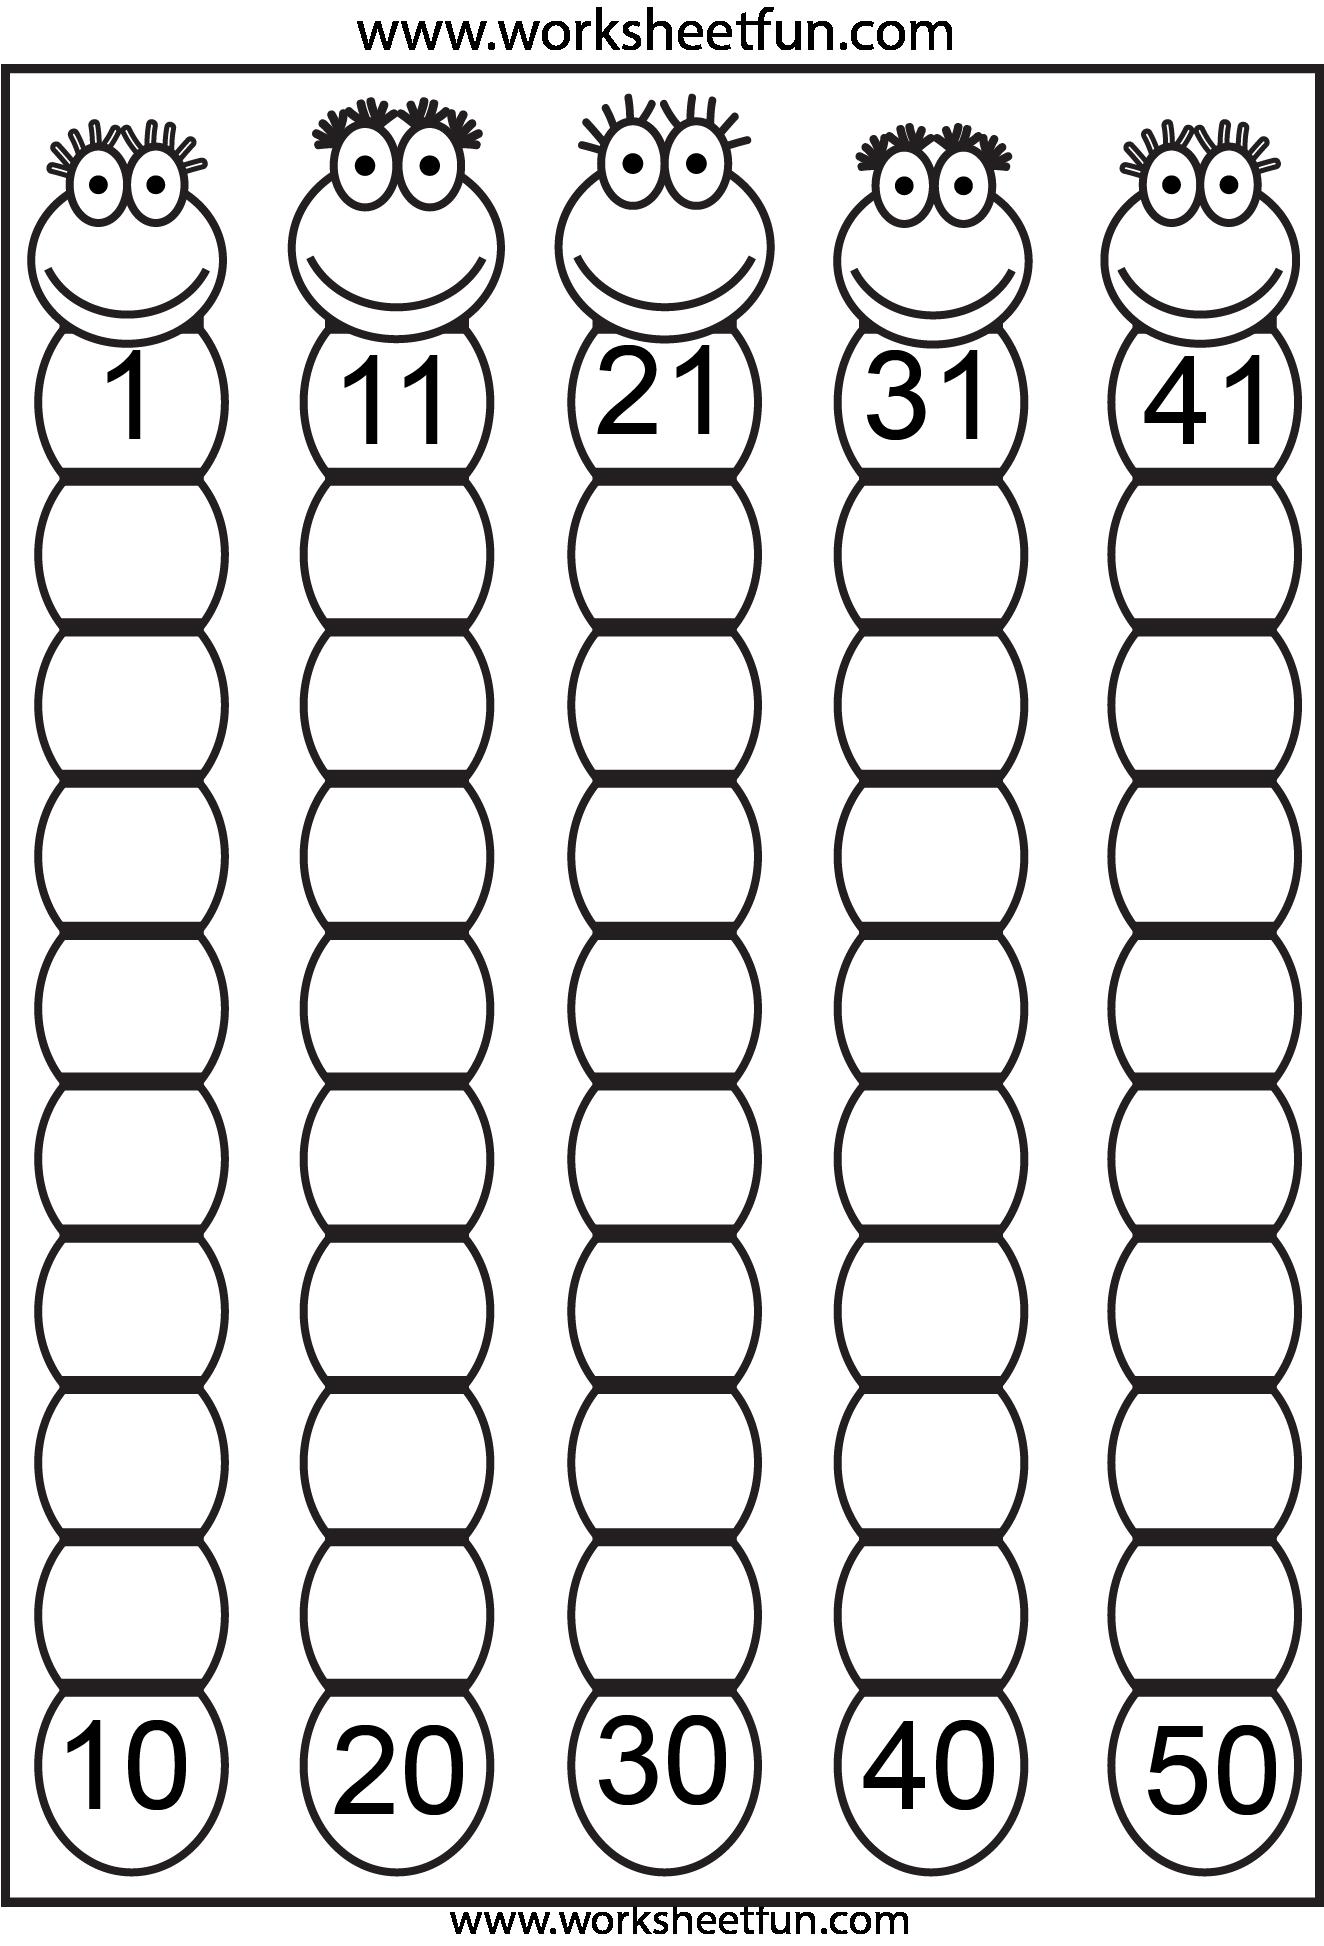 Missing numbers 1-50 | Schulanfänger Arbeitsblätter | Pinterest ...